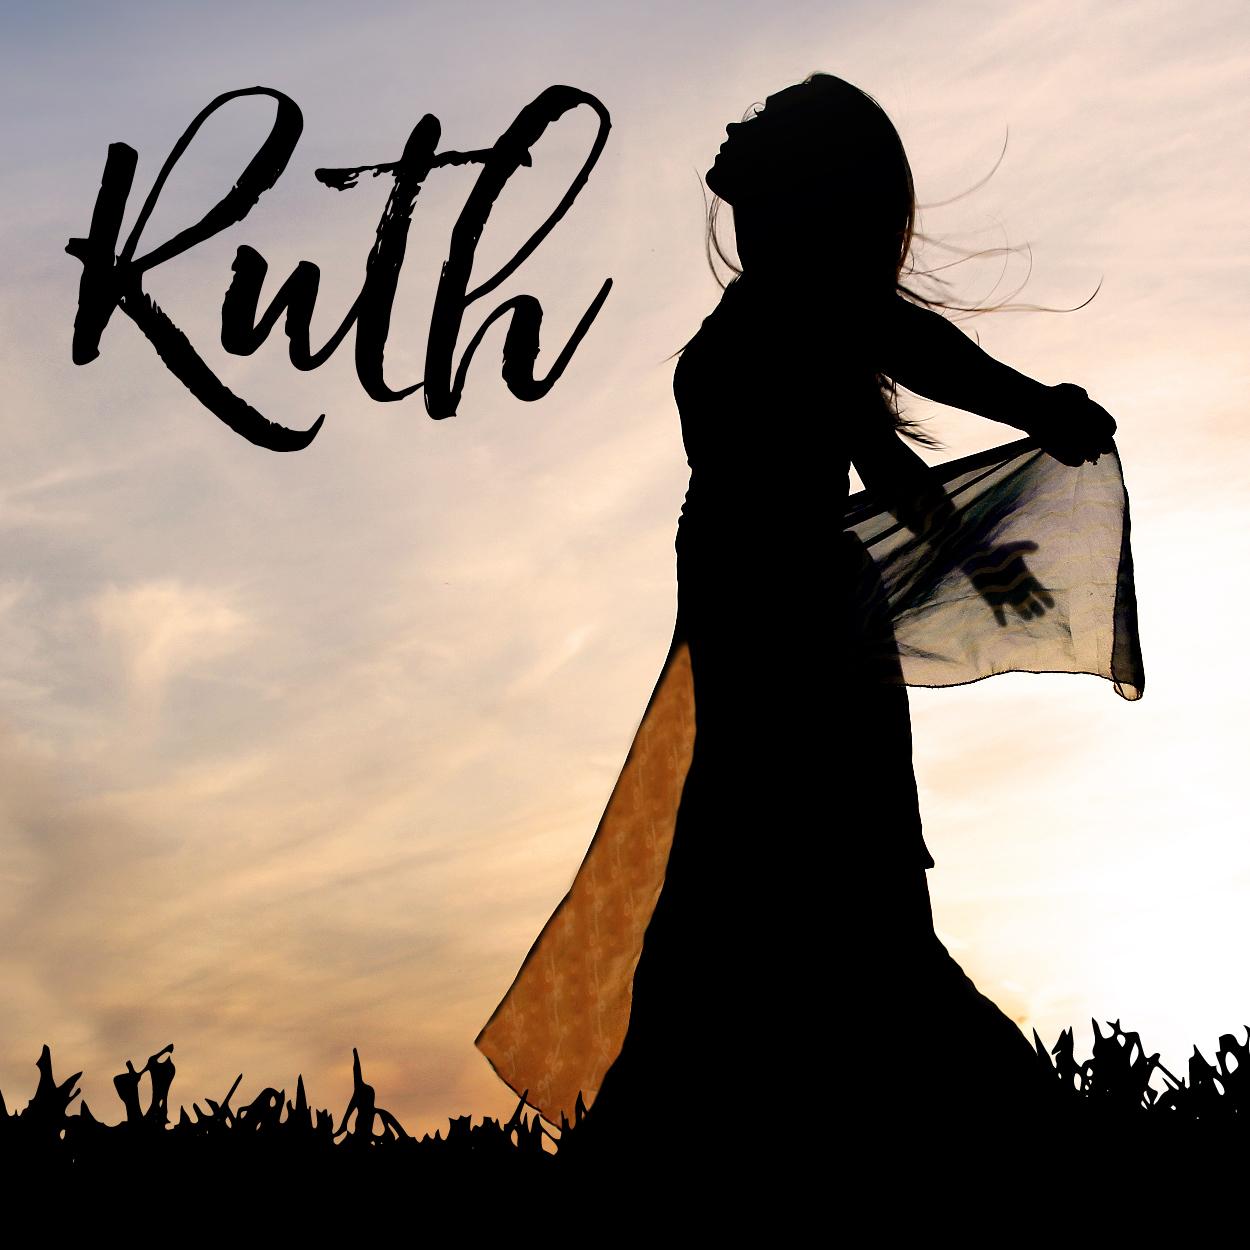 Catalyst_Ruth-01.jpg